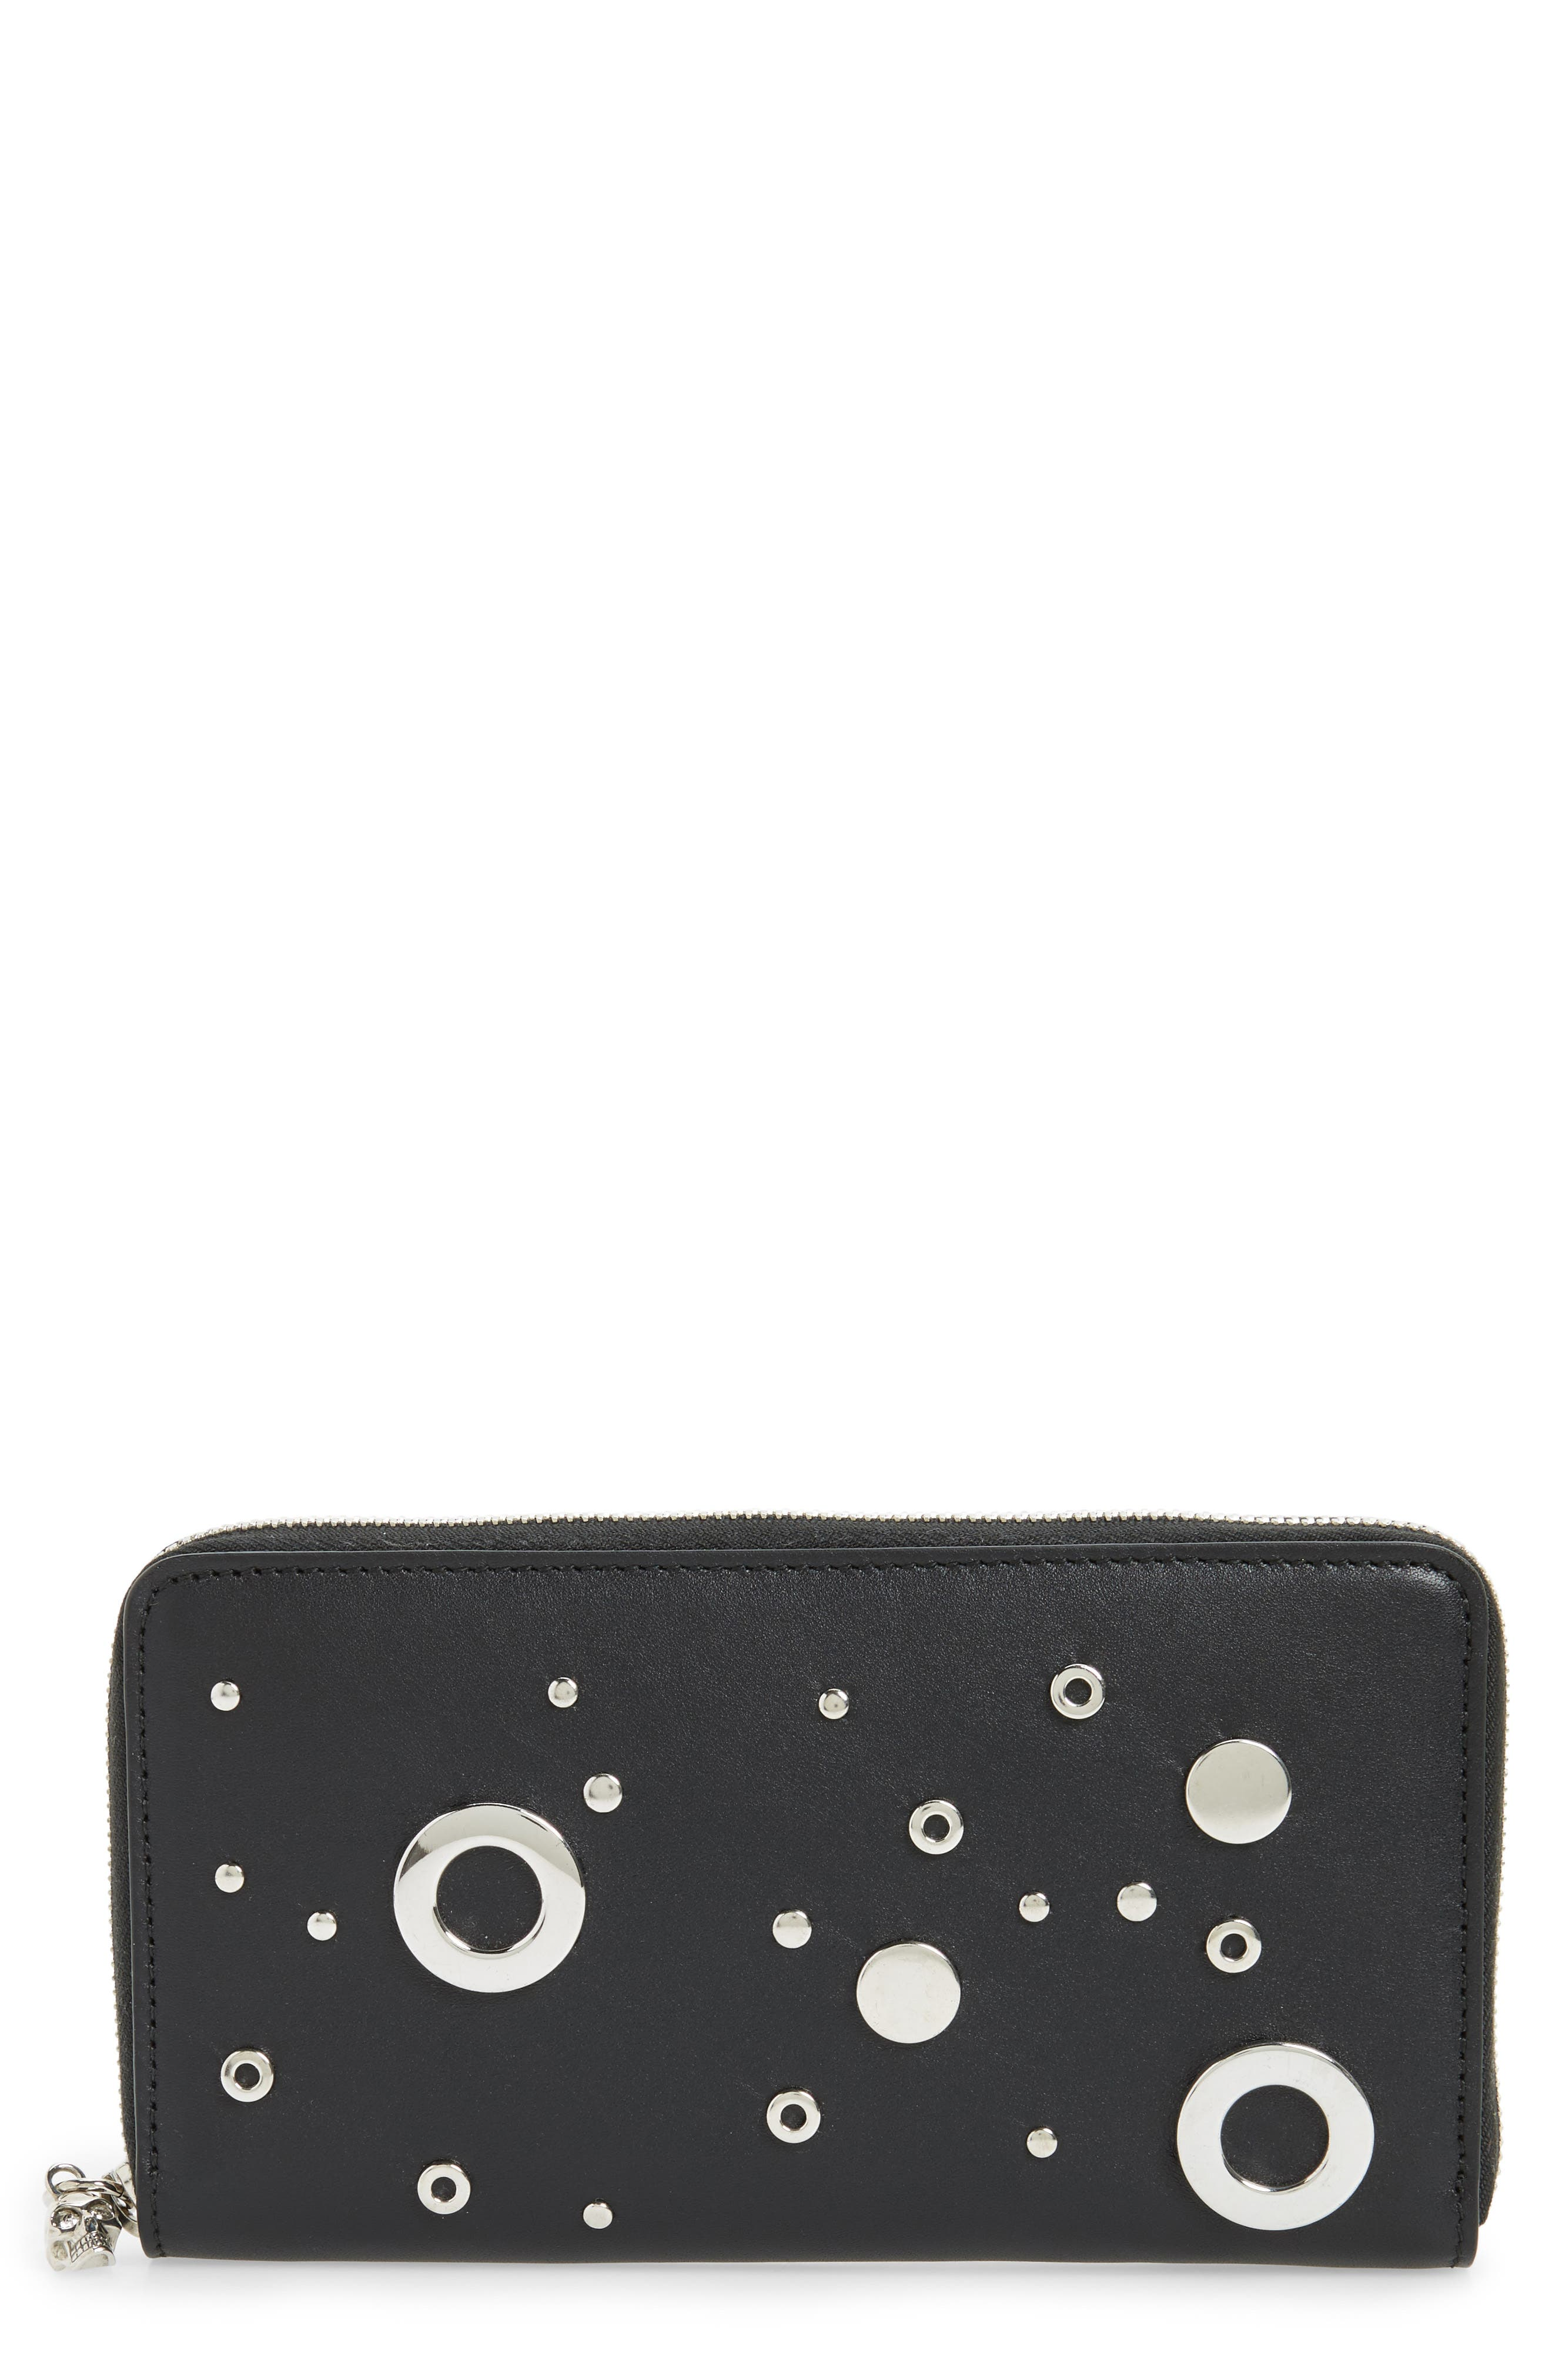 Grommet & Stud Calfskin Leather Continental Wallet,                             Main thumbnail 1, color,                             Black